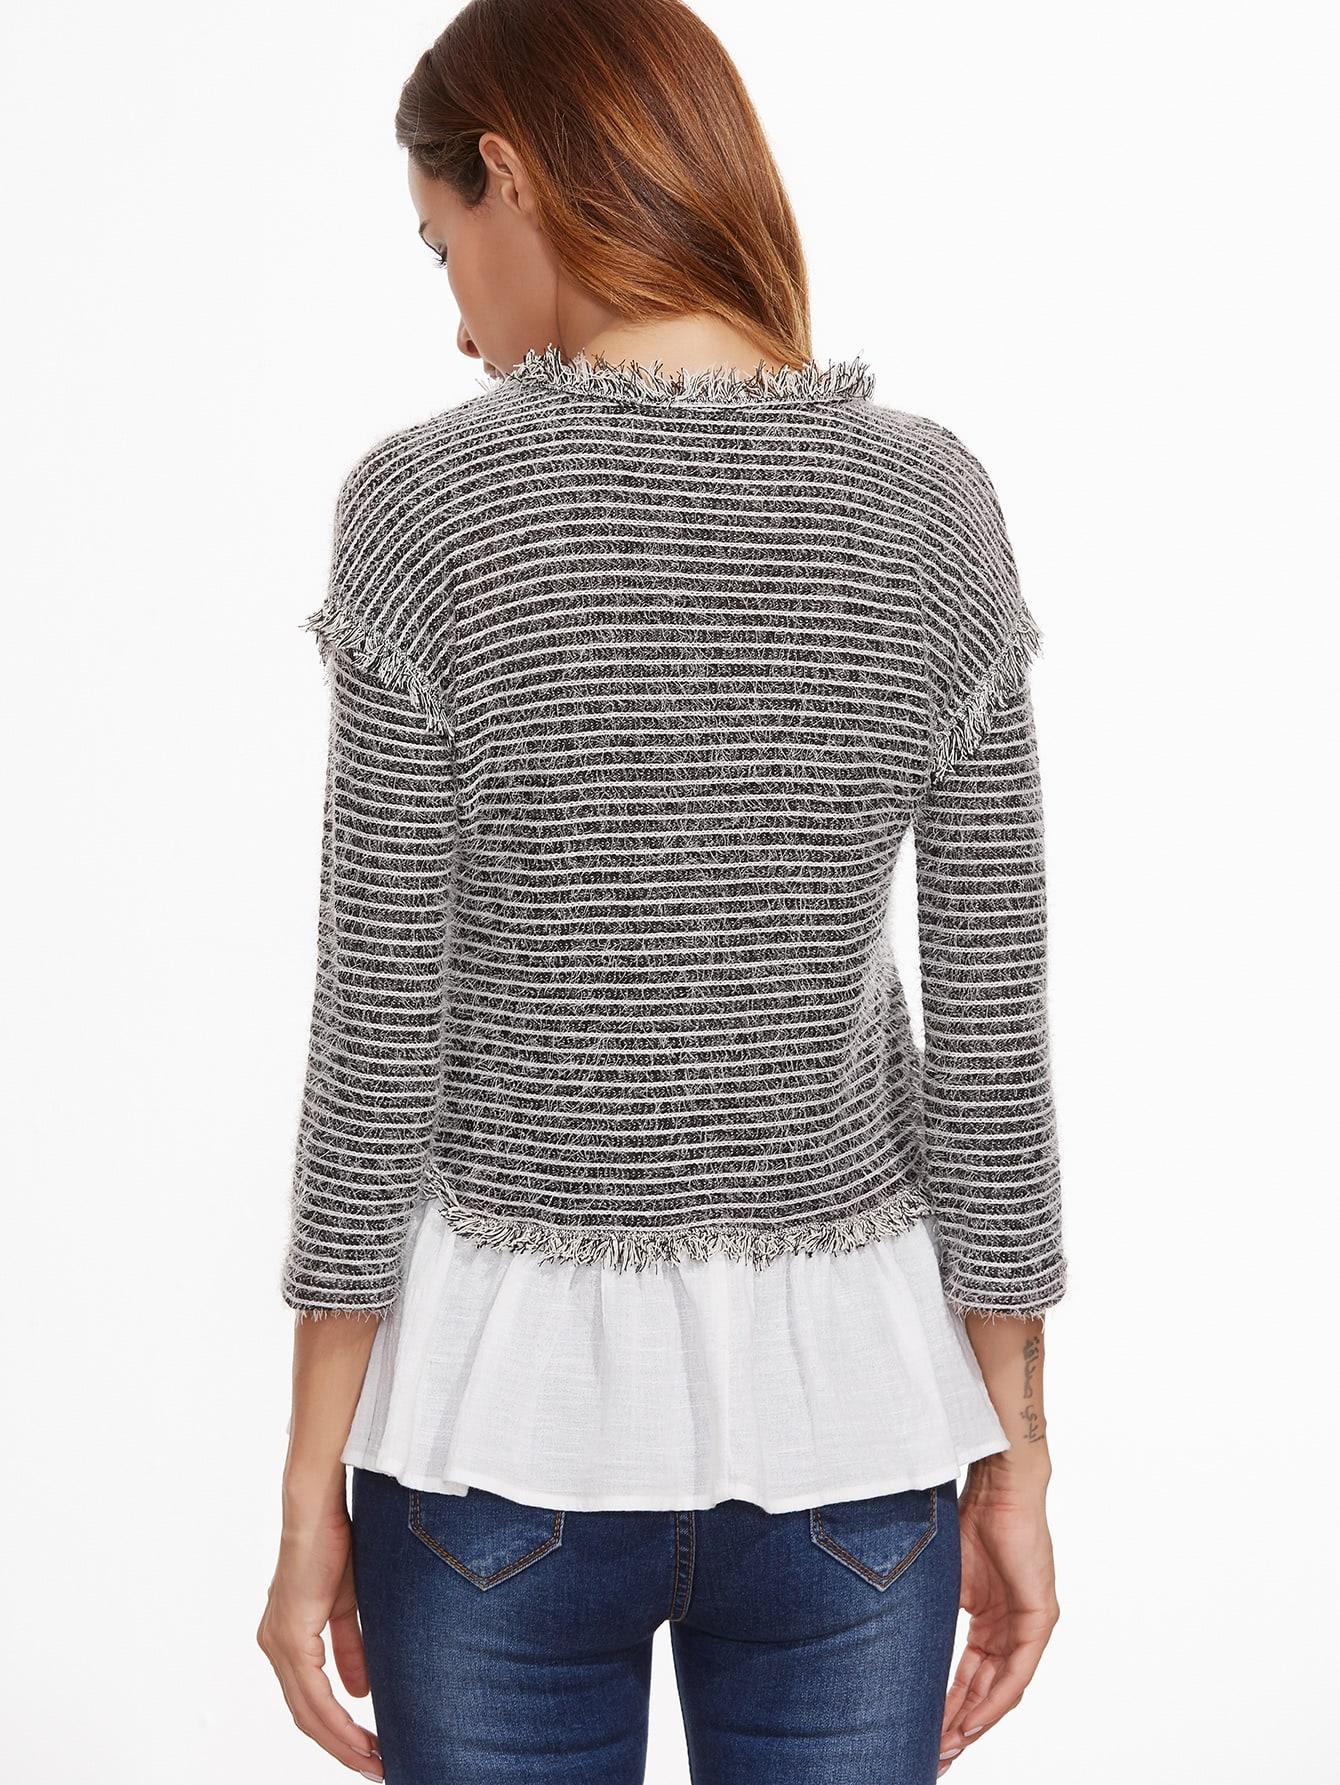 sweater161027701_2